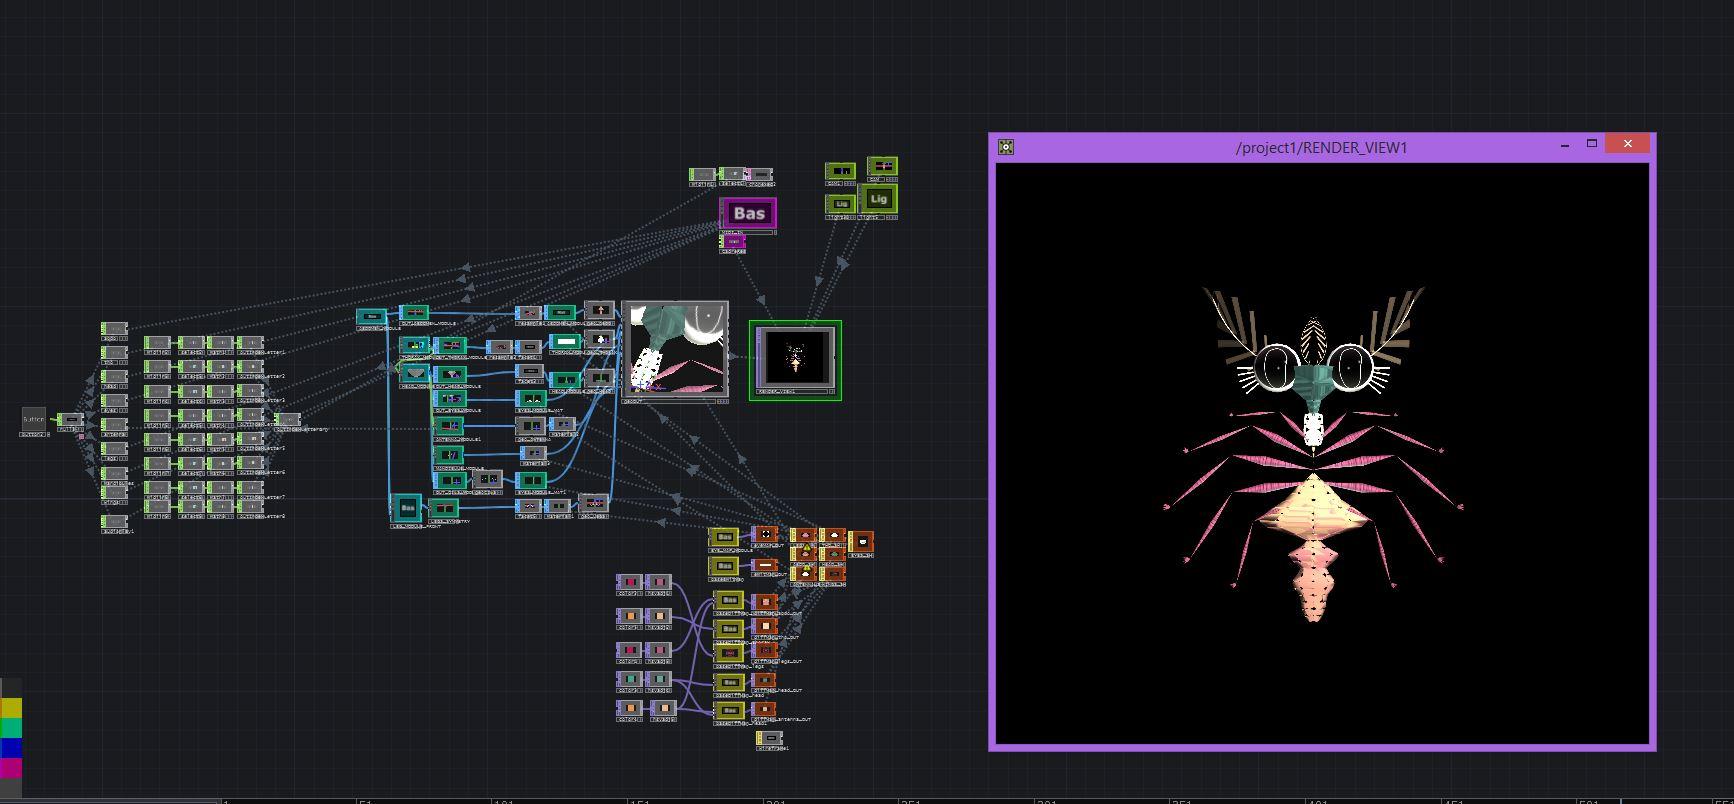 superbug_screen1.jpg